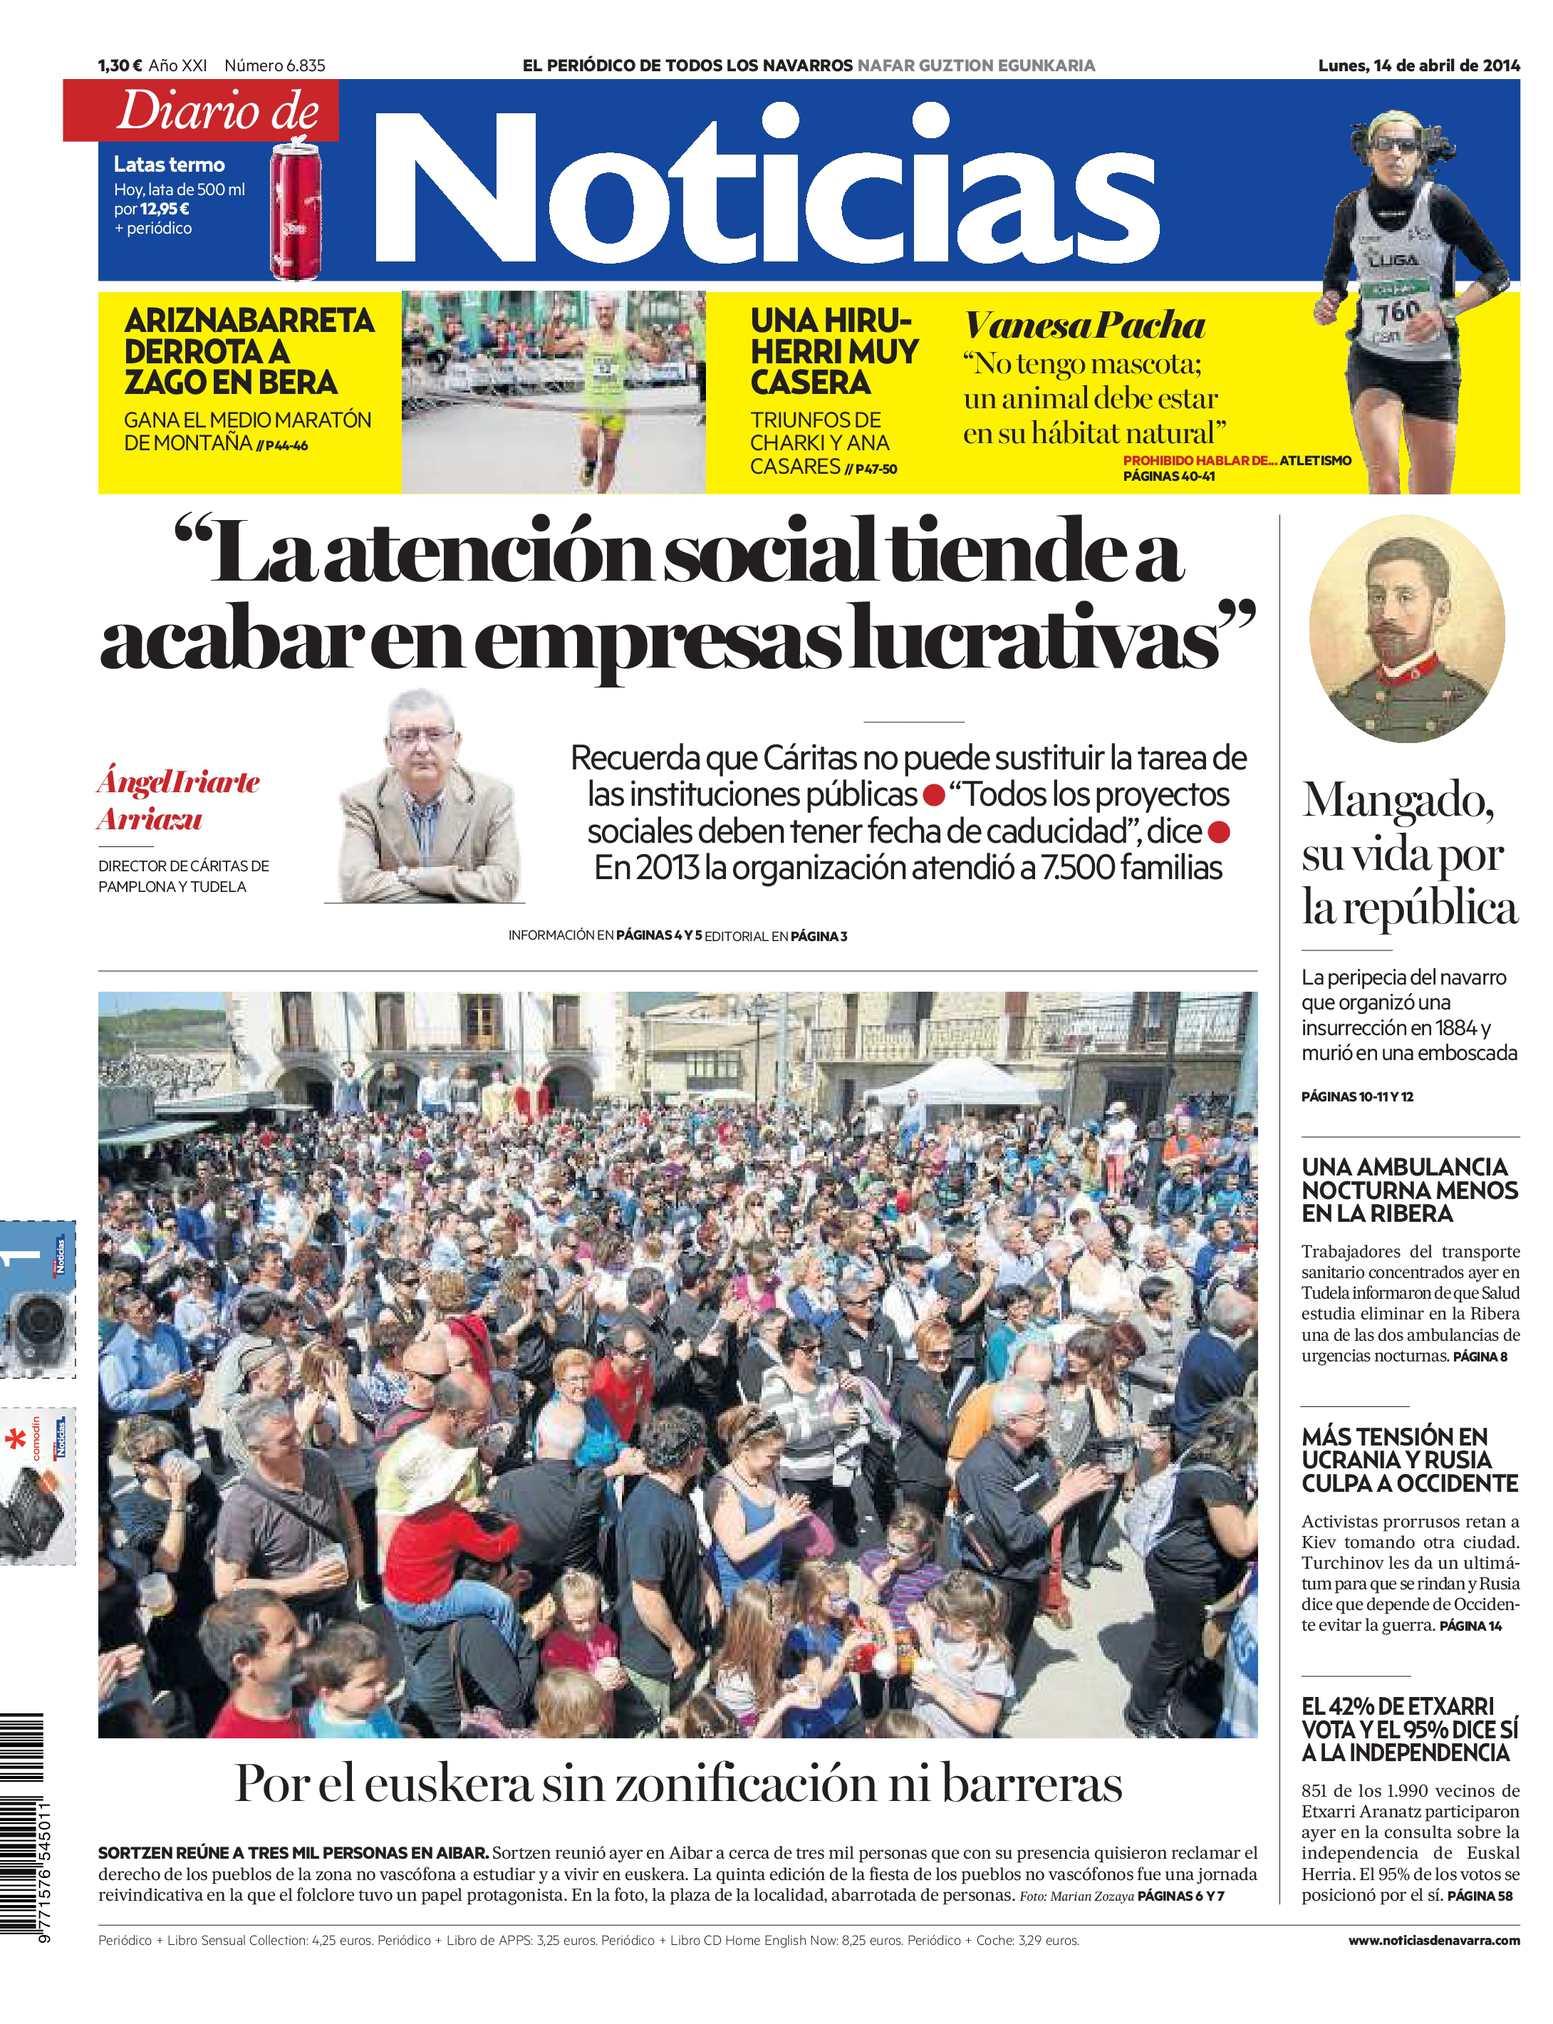 MONEDEROS MILITARES VETERANOS UNIDADES HISTORICAS DIVISION DE MONTAÑA URGEL